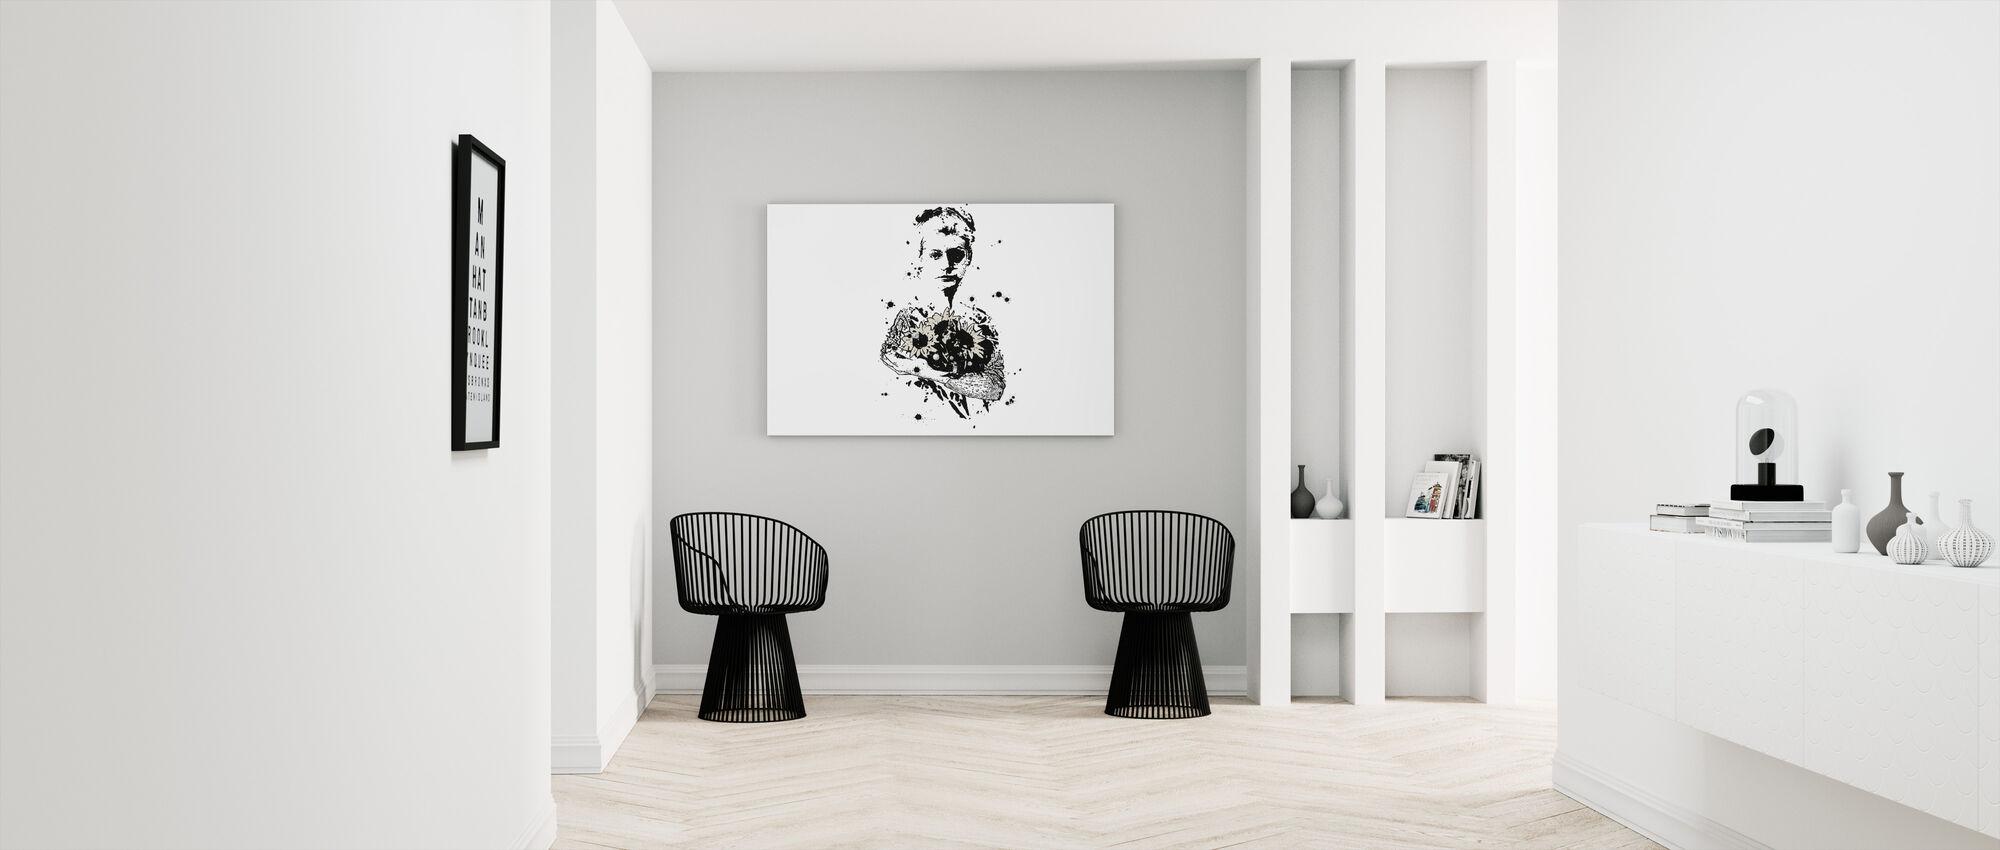 Uudistaja - Canvastaulu - Aula